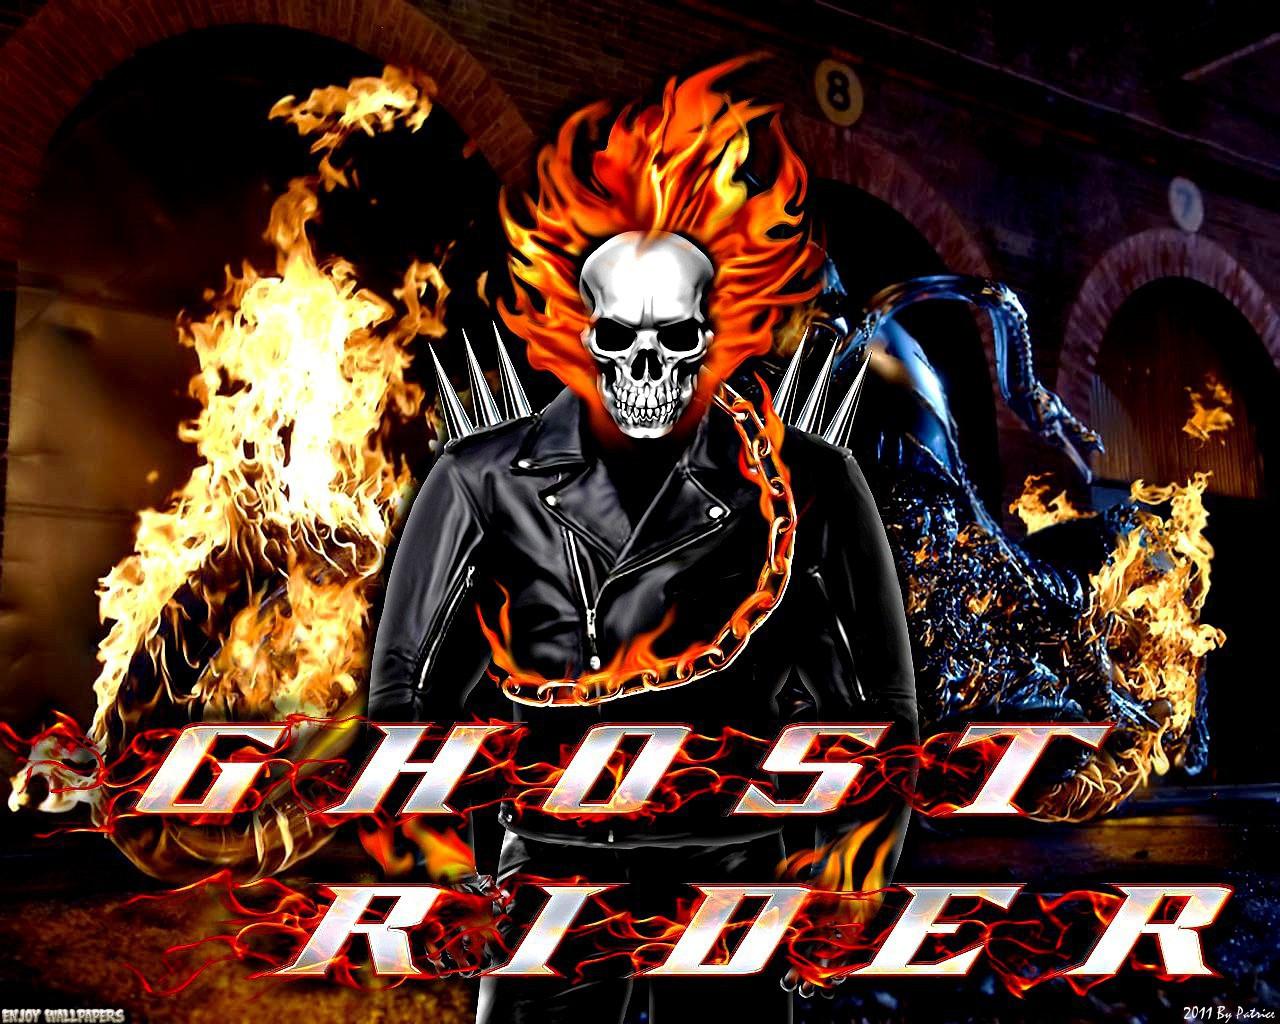 http://2.bp.blogspot.com/-NQ6TLWTQMu4/T57dFmDyalI/AAAAAAAAAwk/pUyiOraTIlA/s1600/Ghost+Rider+2+Wallpaper+1280x1024+By+Patrice.jpg